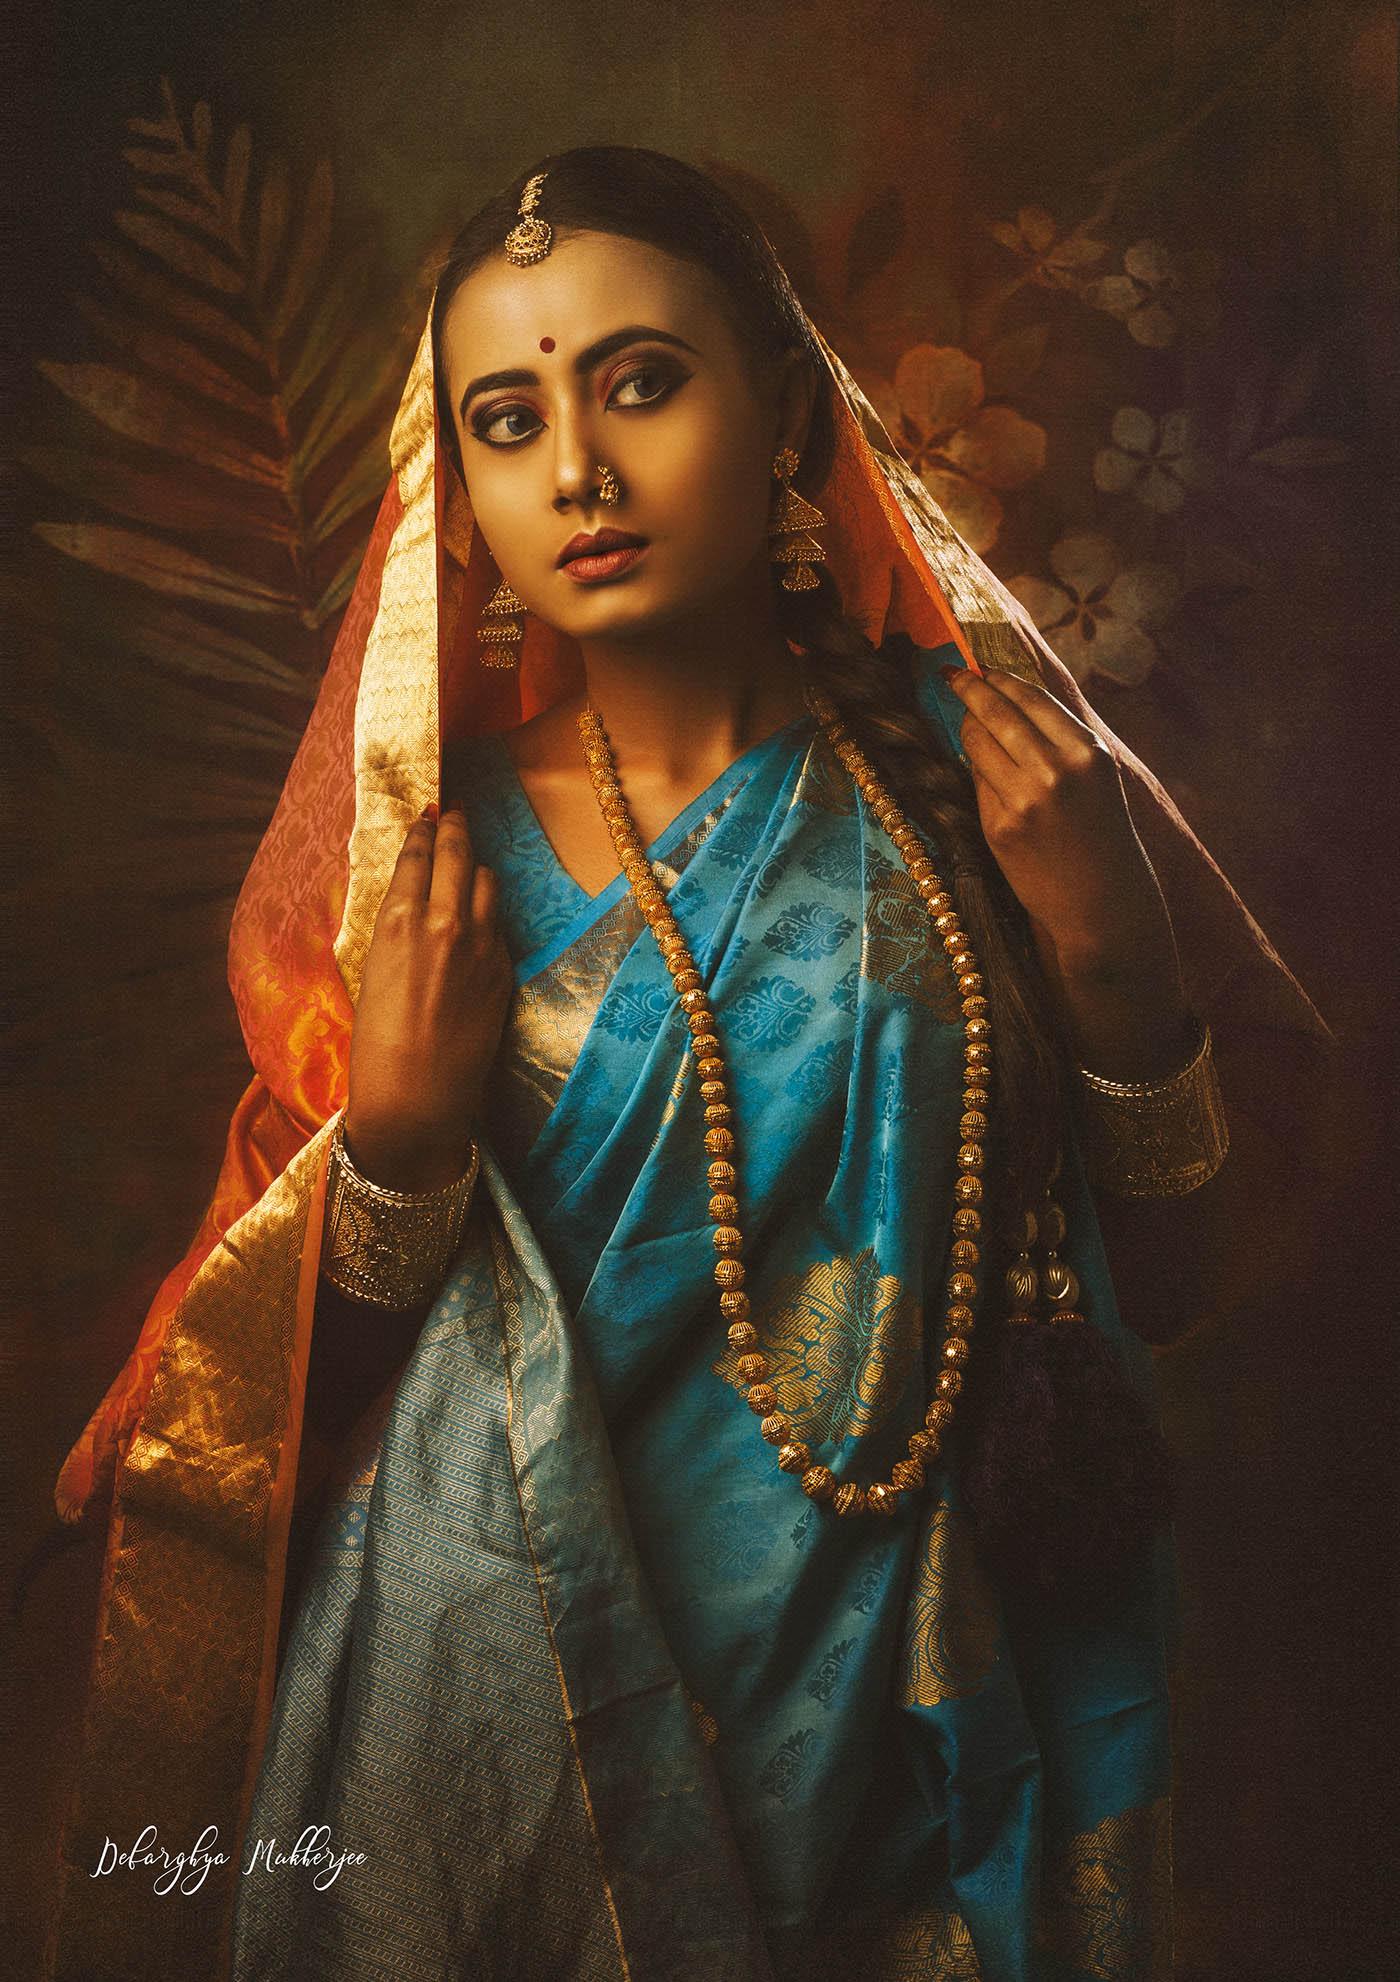 portrait photography indian lady